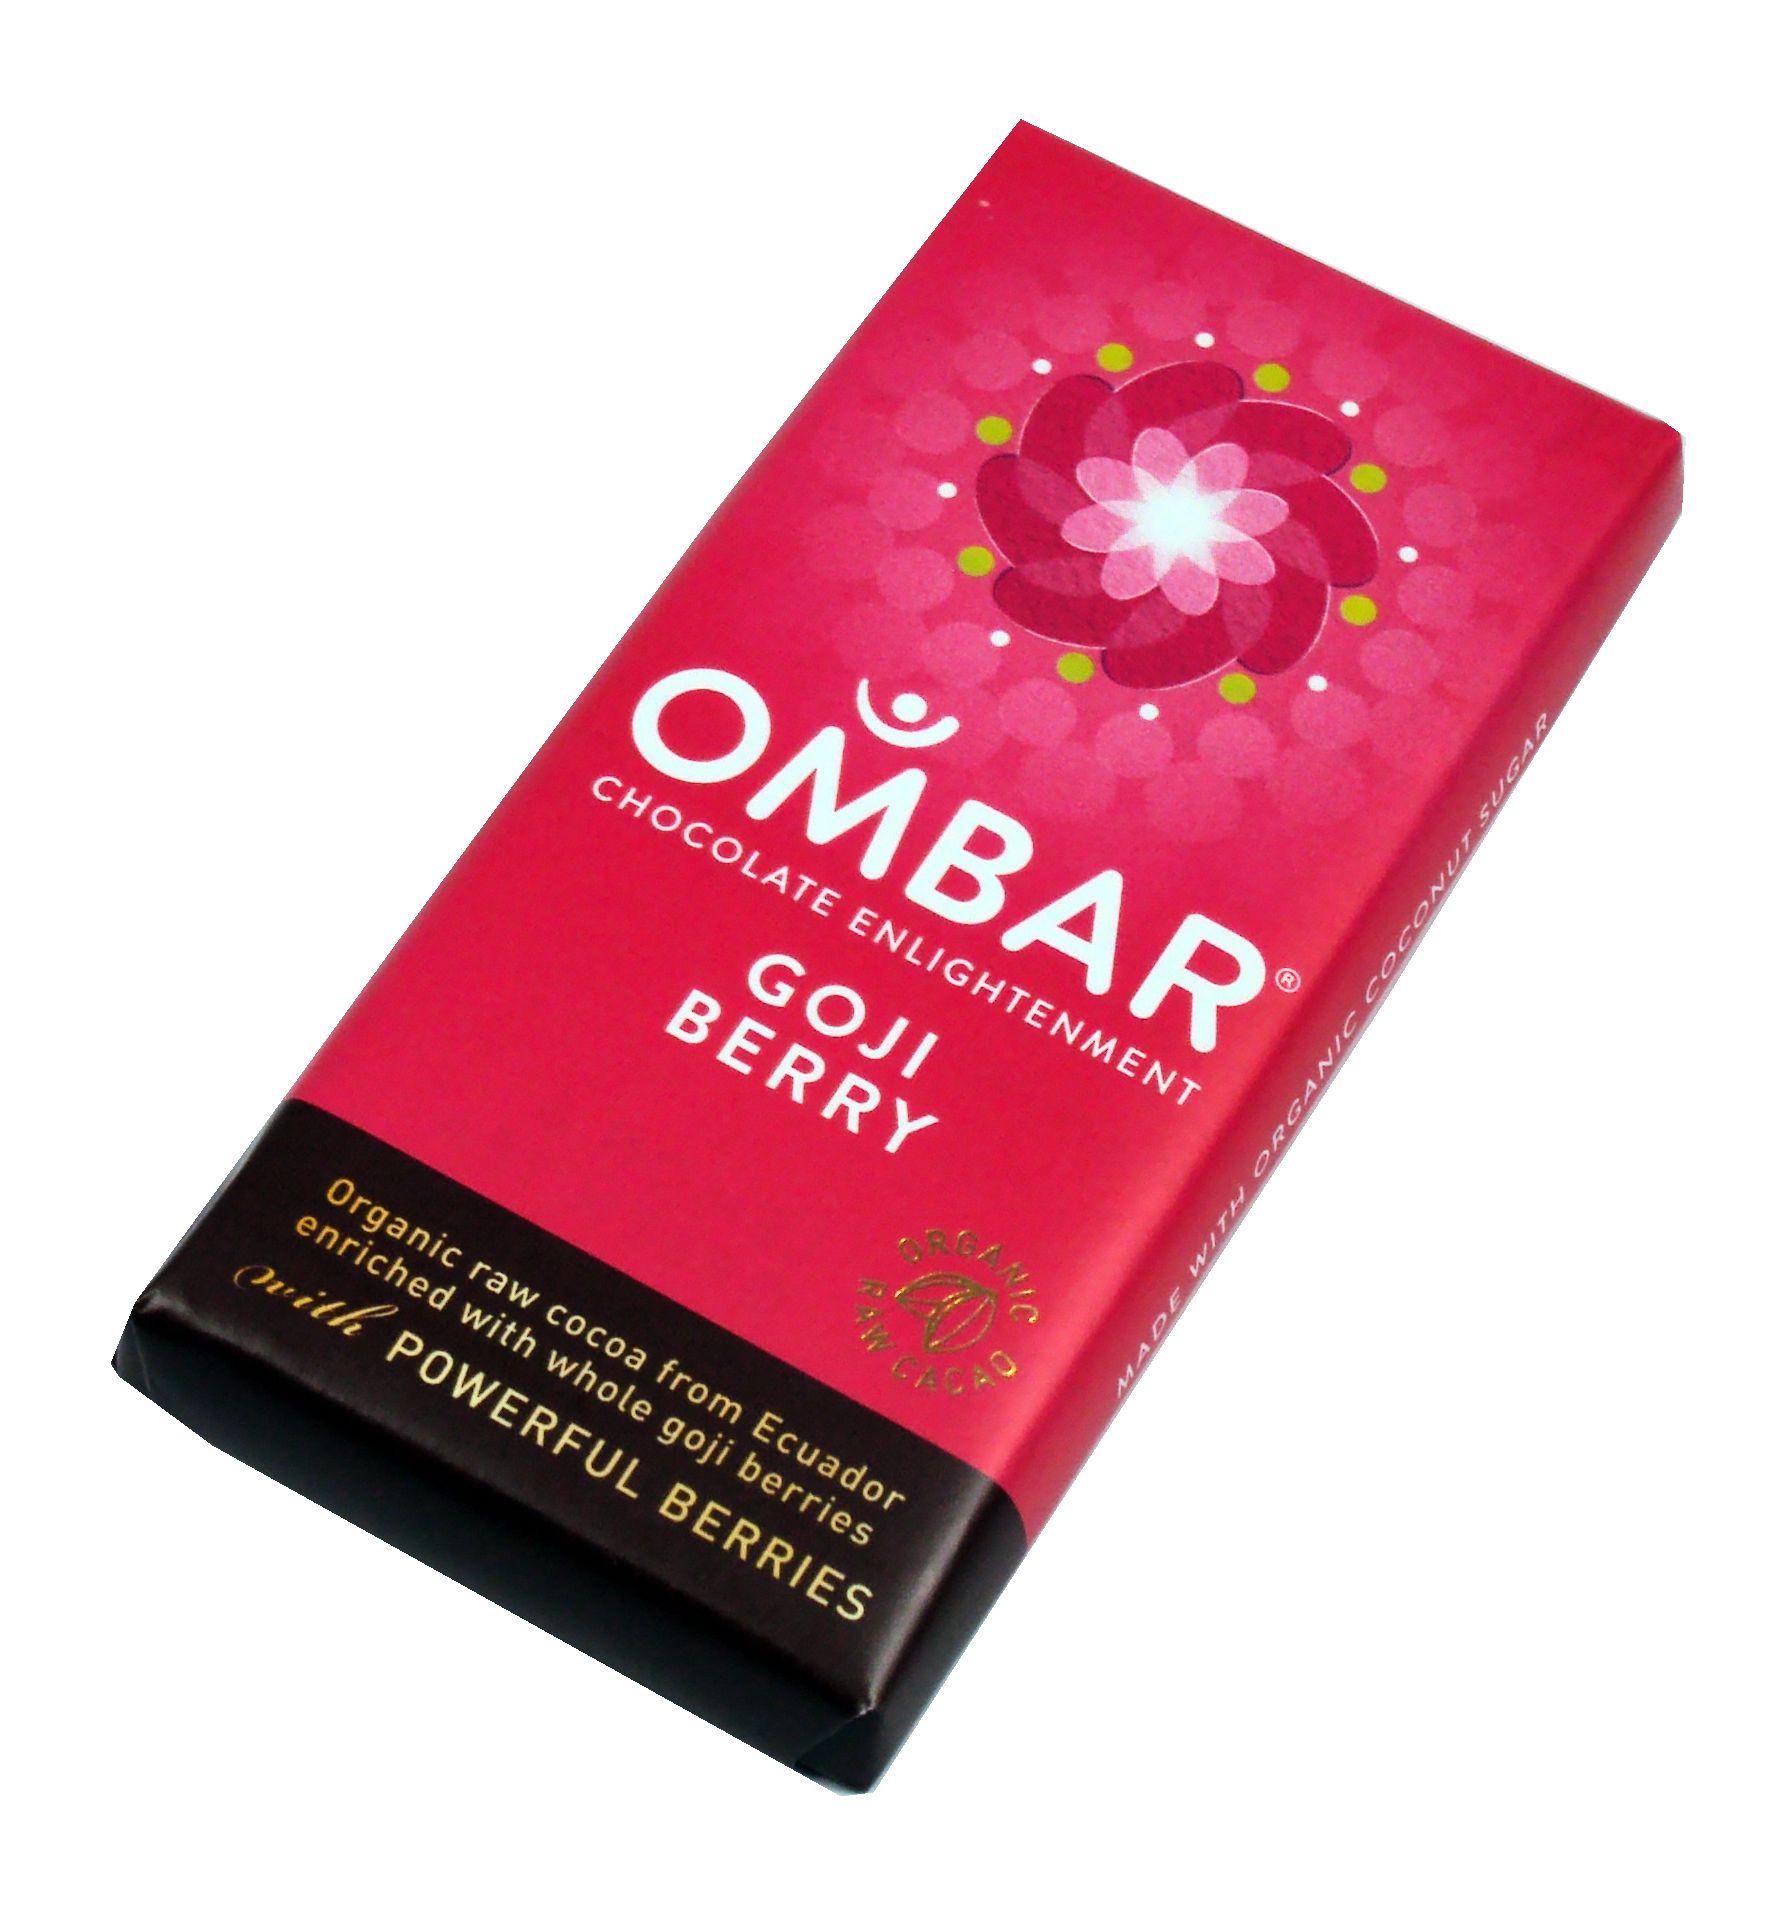 Goji Berry Ombar Raw Chocolate Bar